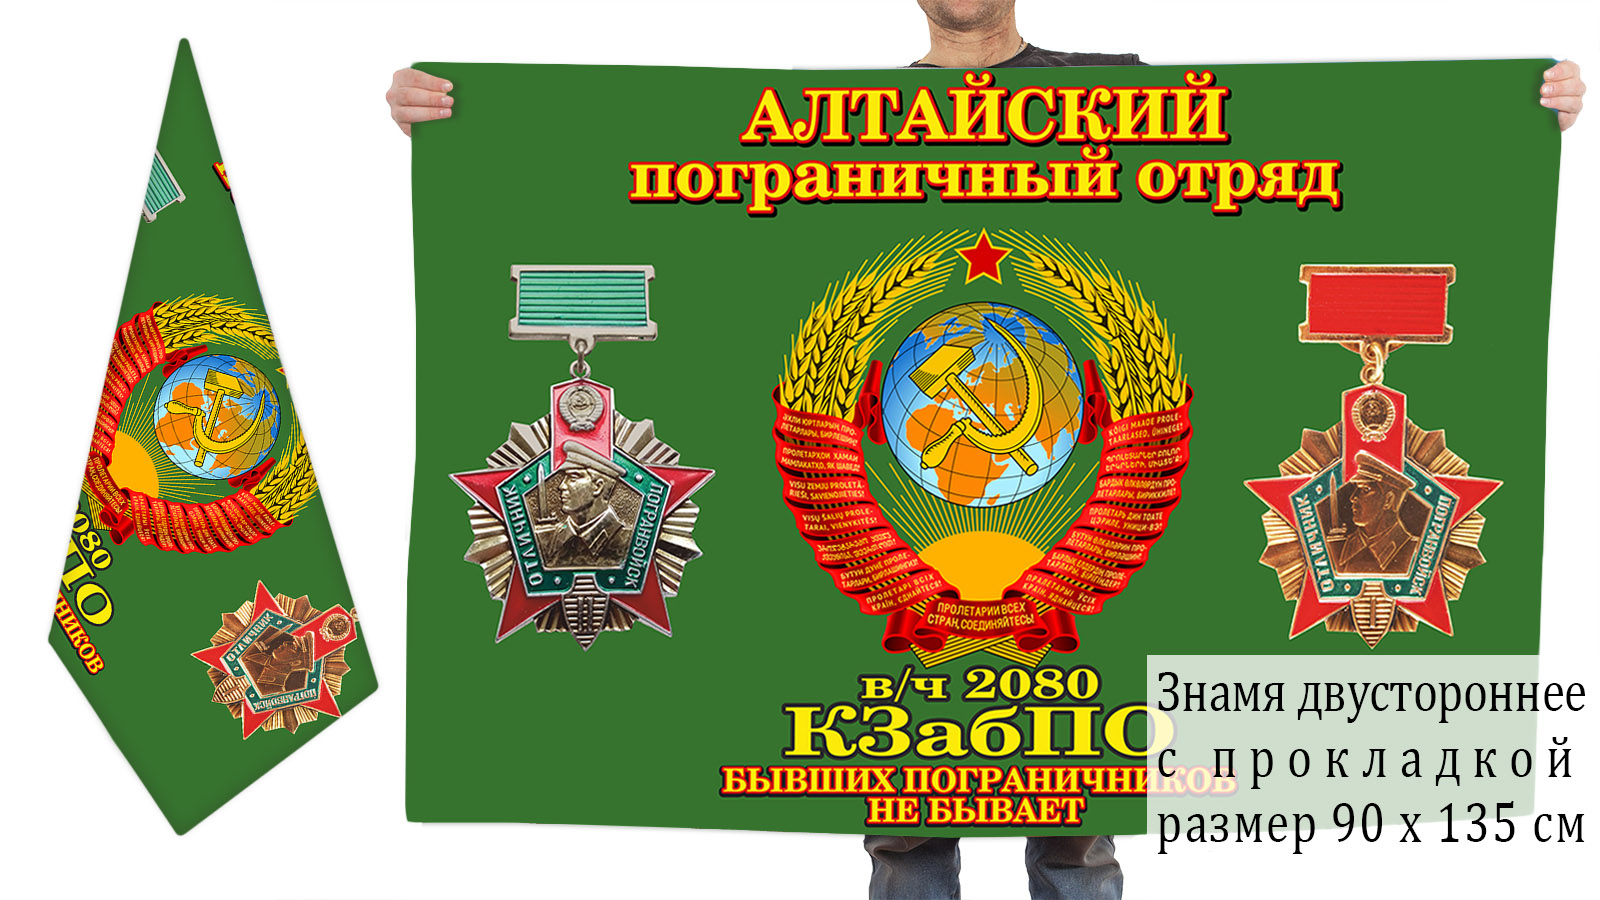 Двусторонний флаг Алтайского пограничного отряда